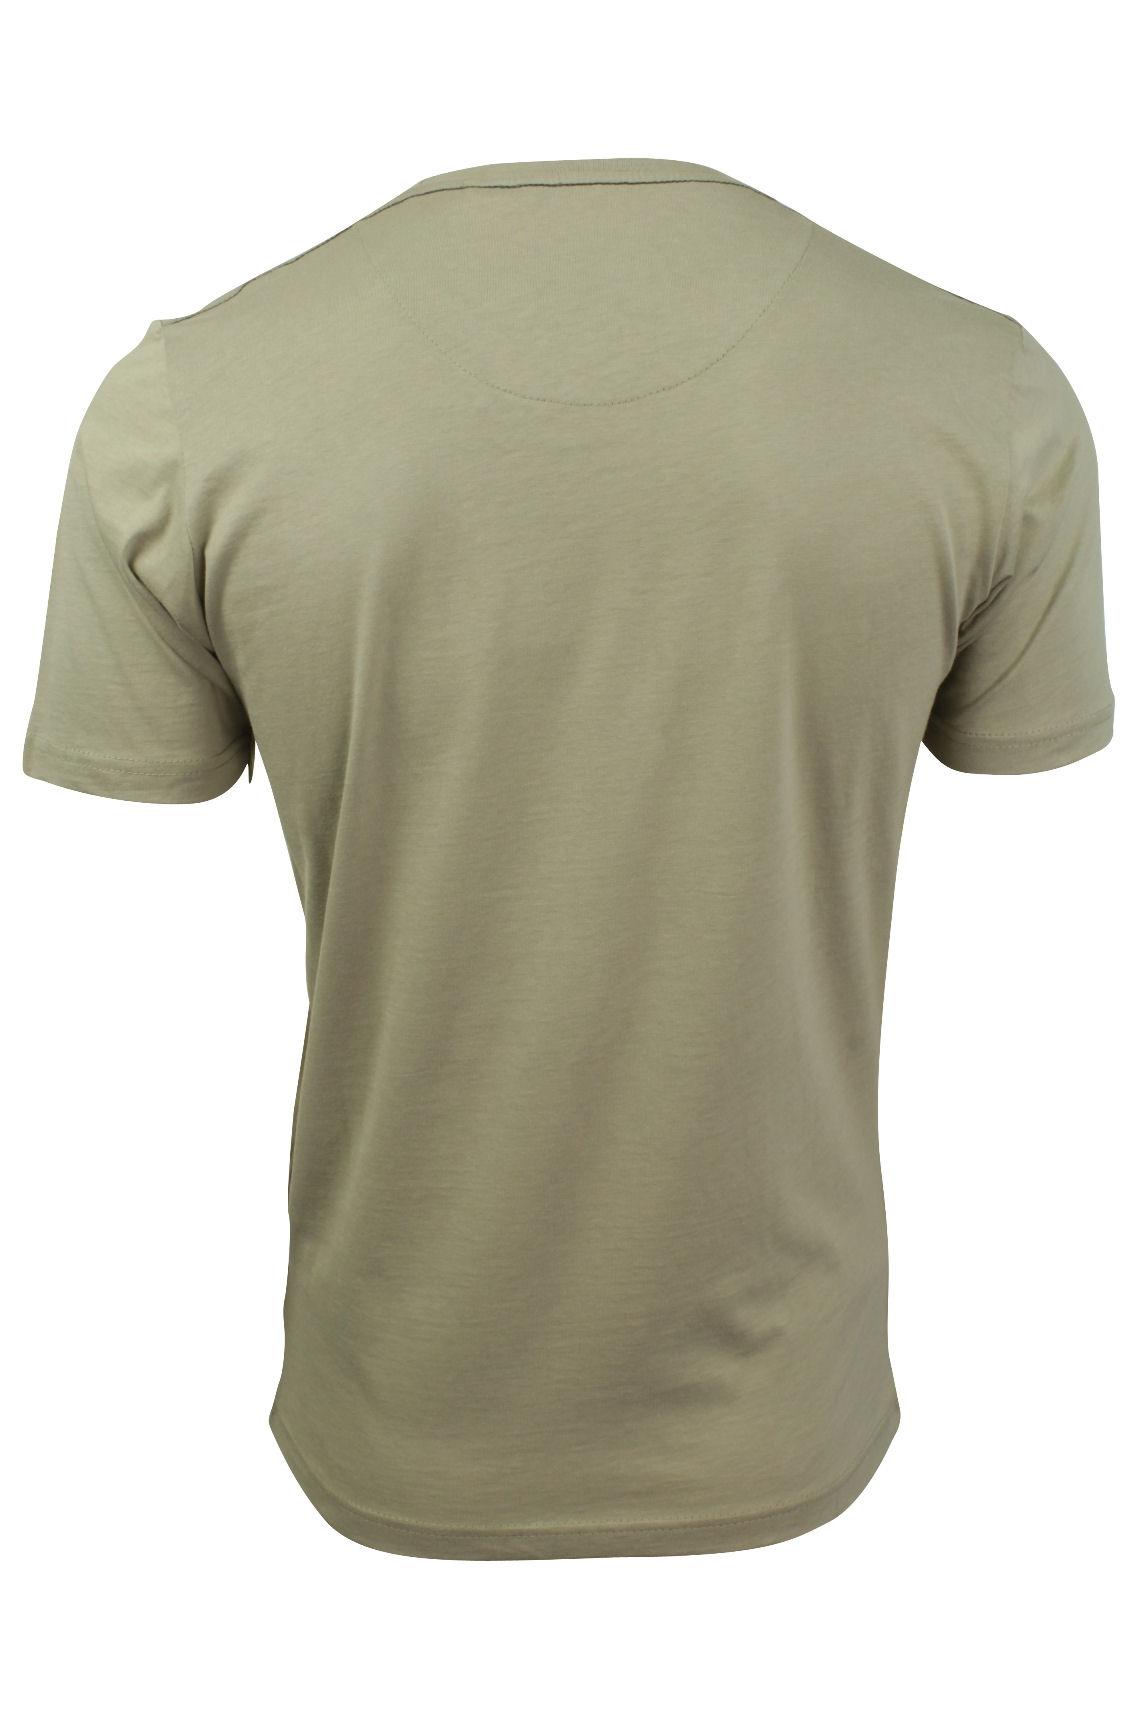 Firetrap-Hombre-Camiseta-de-manga-corta-039-Towson-039 miniatura 7